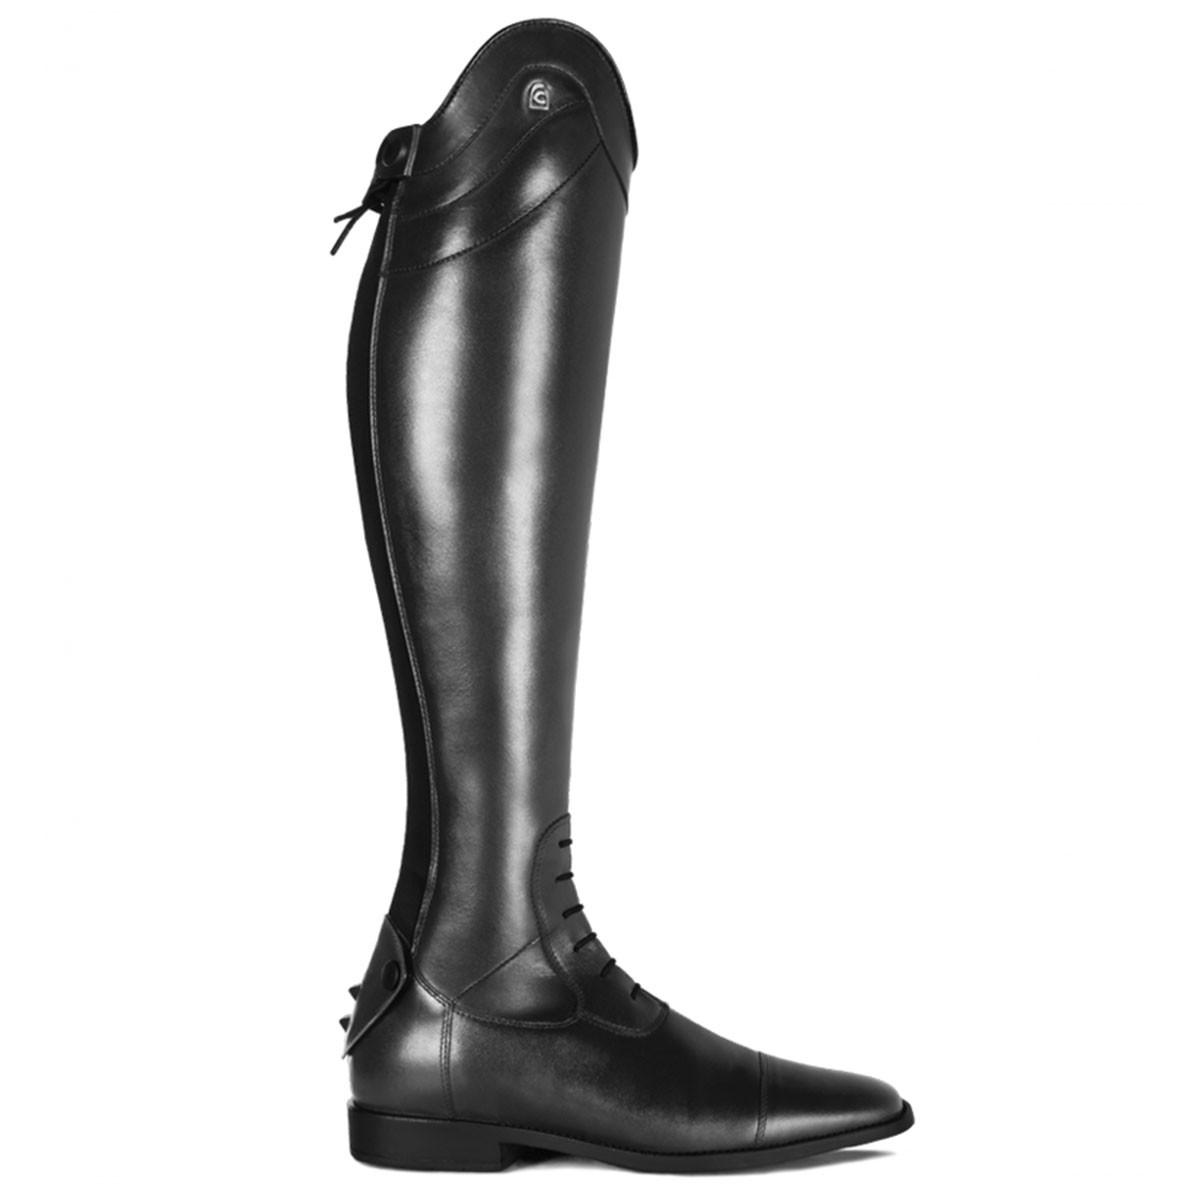 Cavallo Linus Slim rijlaars zwart maat:6-6.5 / h49-w36